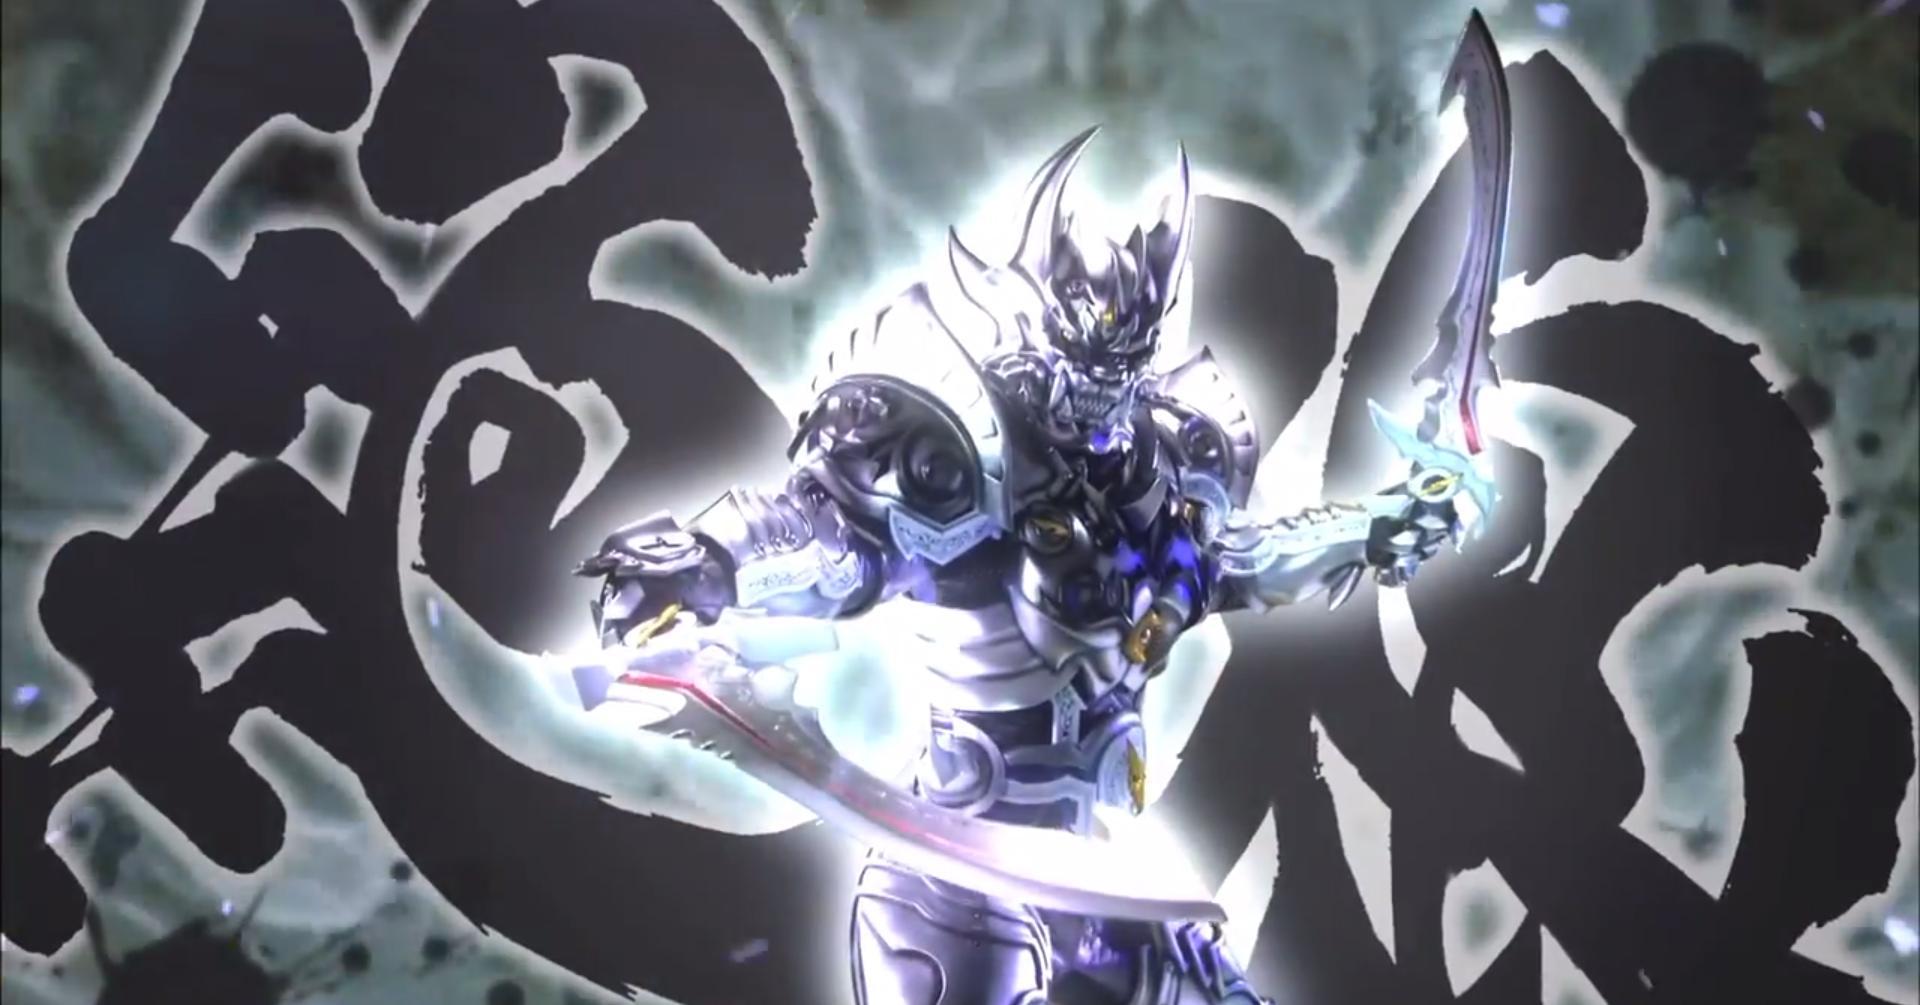 New Trailer for ZERO – Black Blood Released